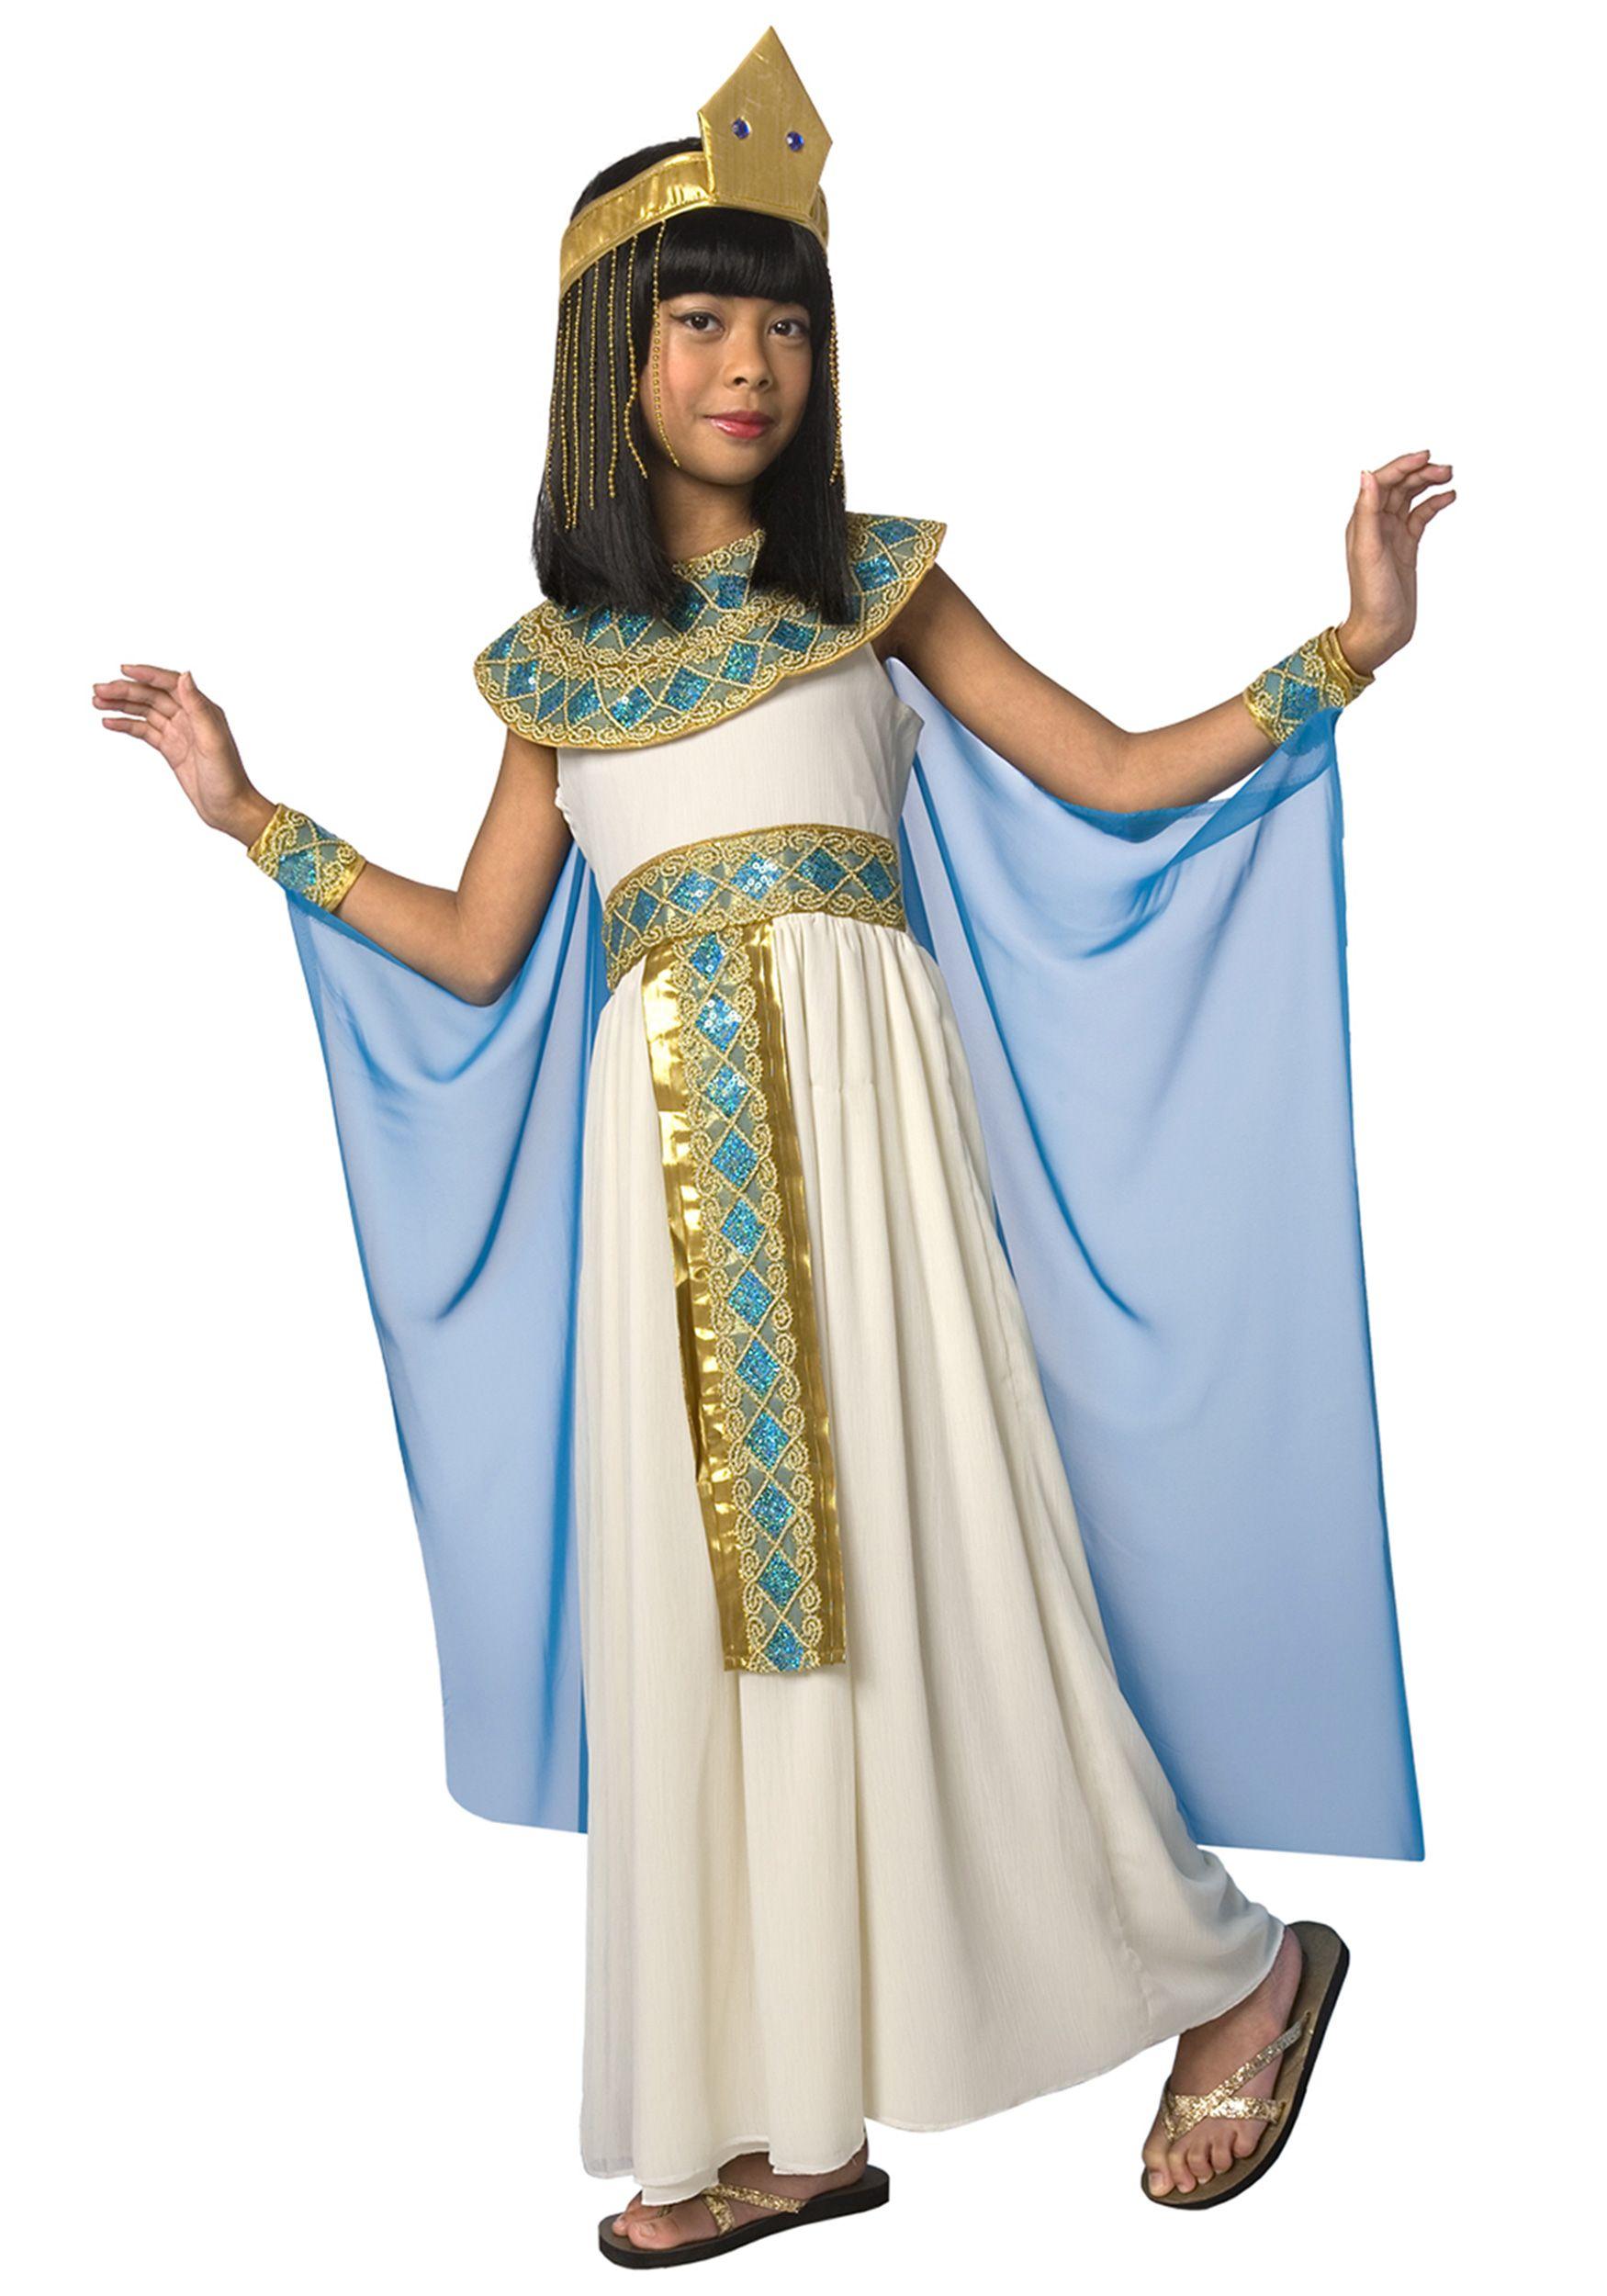 pinsonia sanchez lloyd on costuming | pinterest | costumes